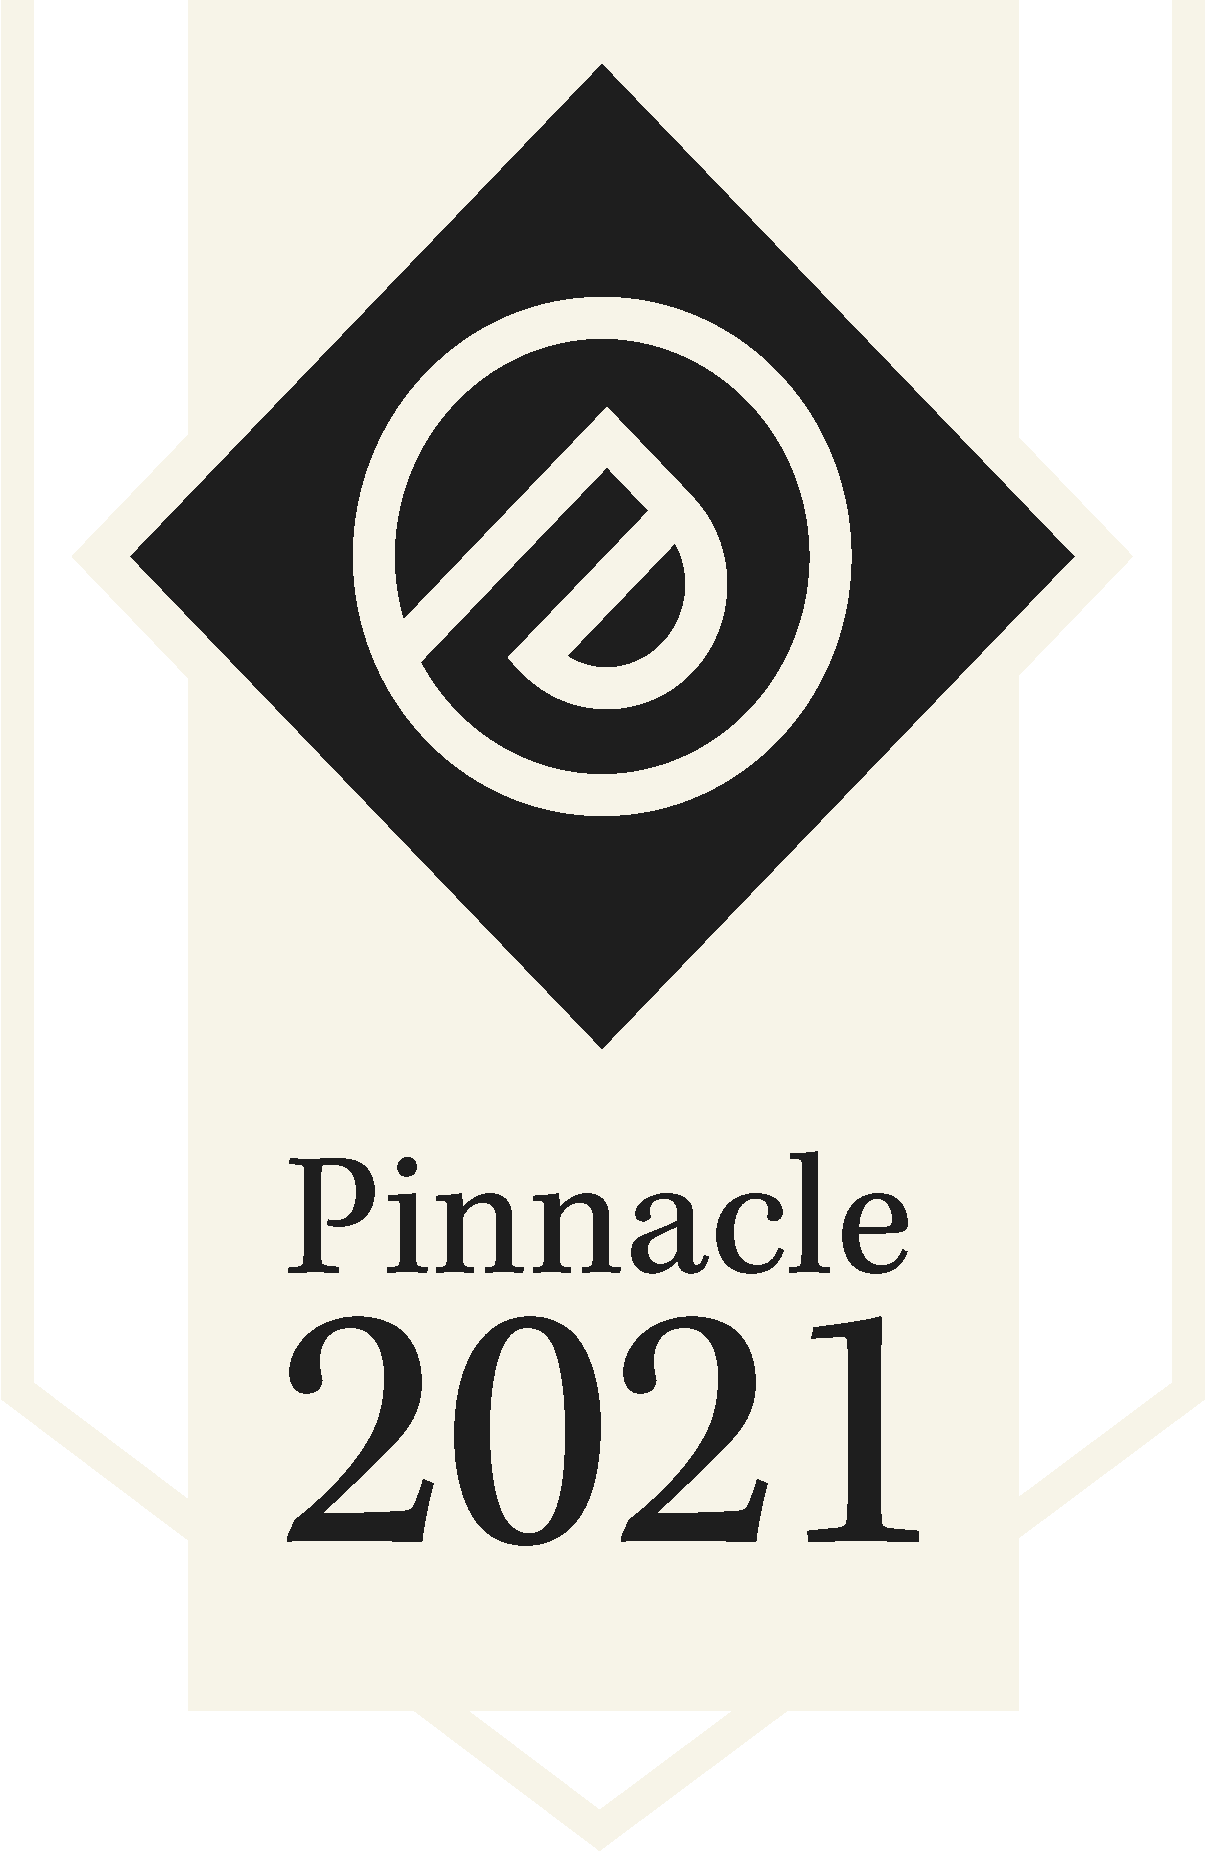 Pinnacle 2021 Badge